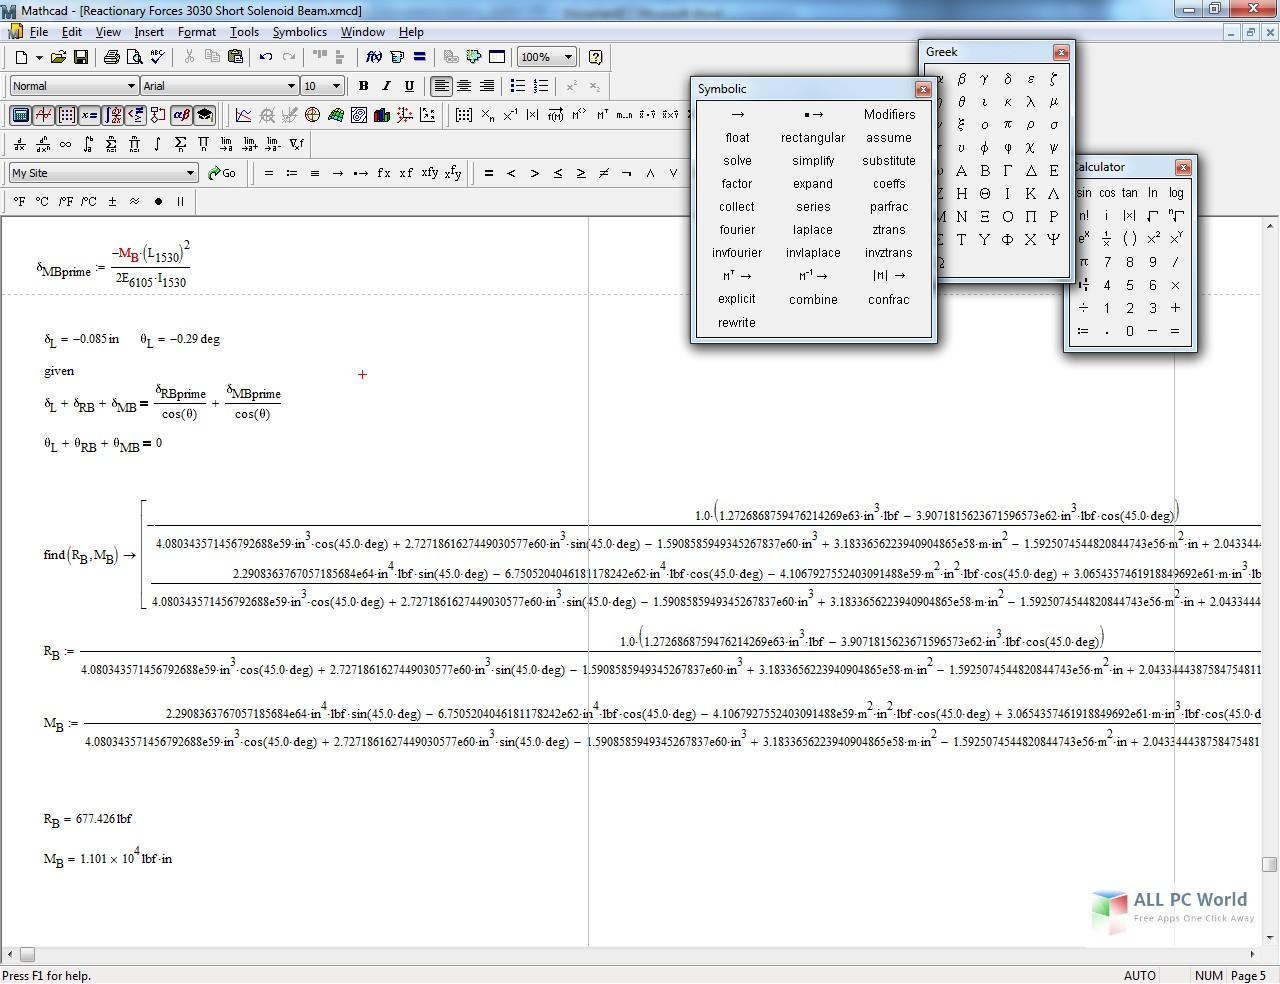 PTC MathCAD 15.0 M045 Review